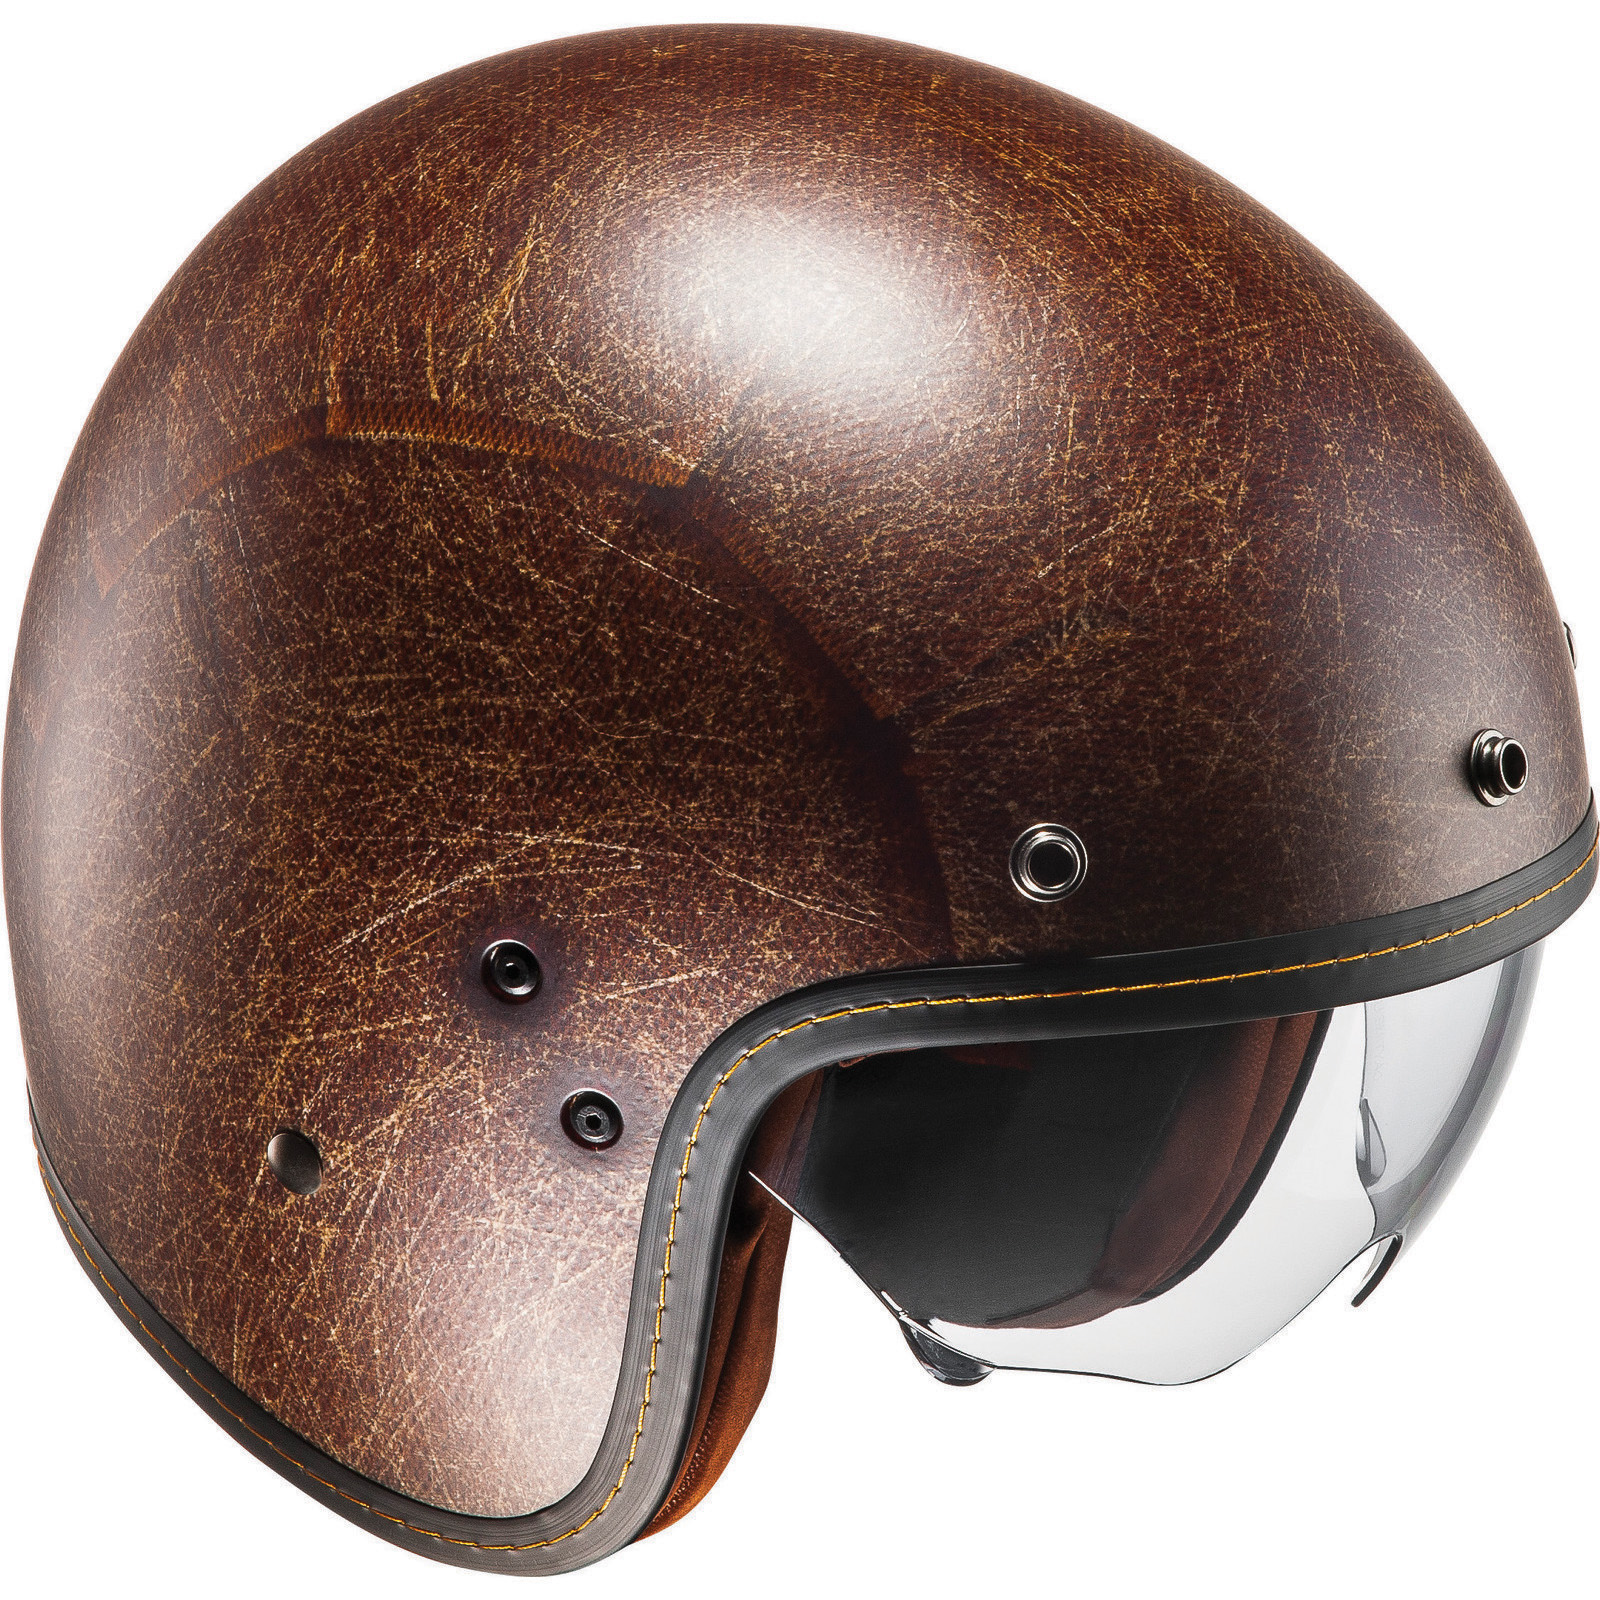 S Gr/ö/ße Vintage Premier APJETVINFIBU9M000S Helme